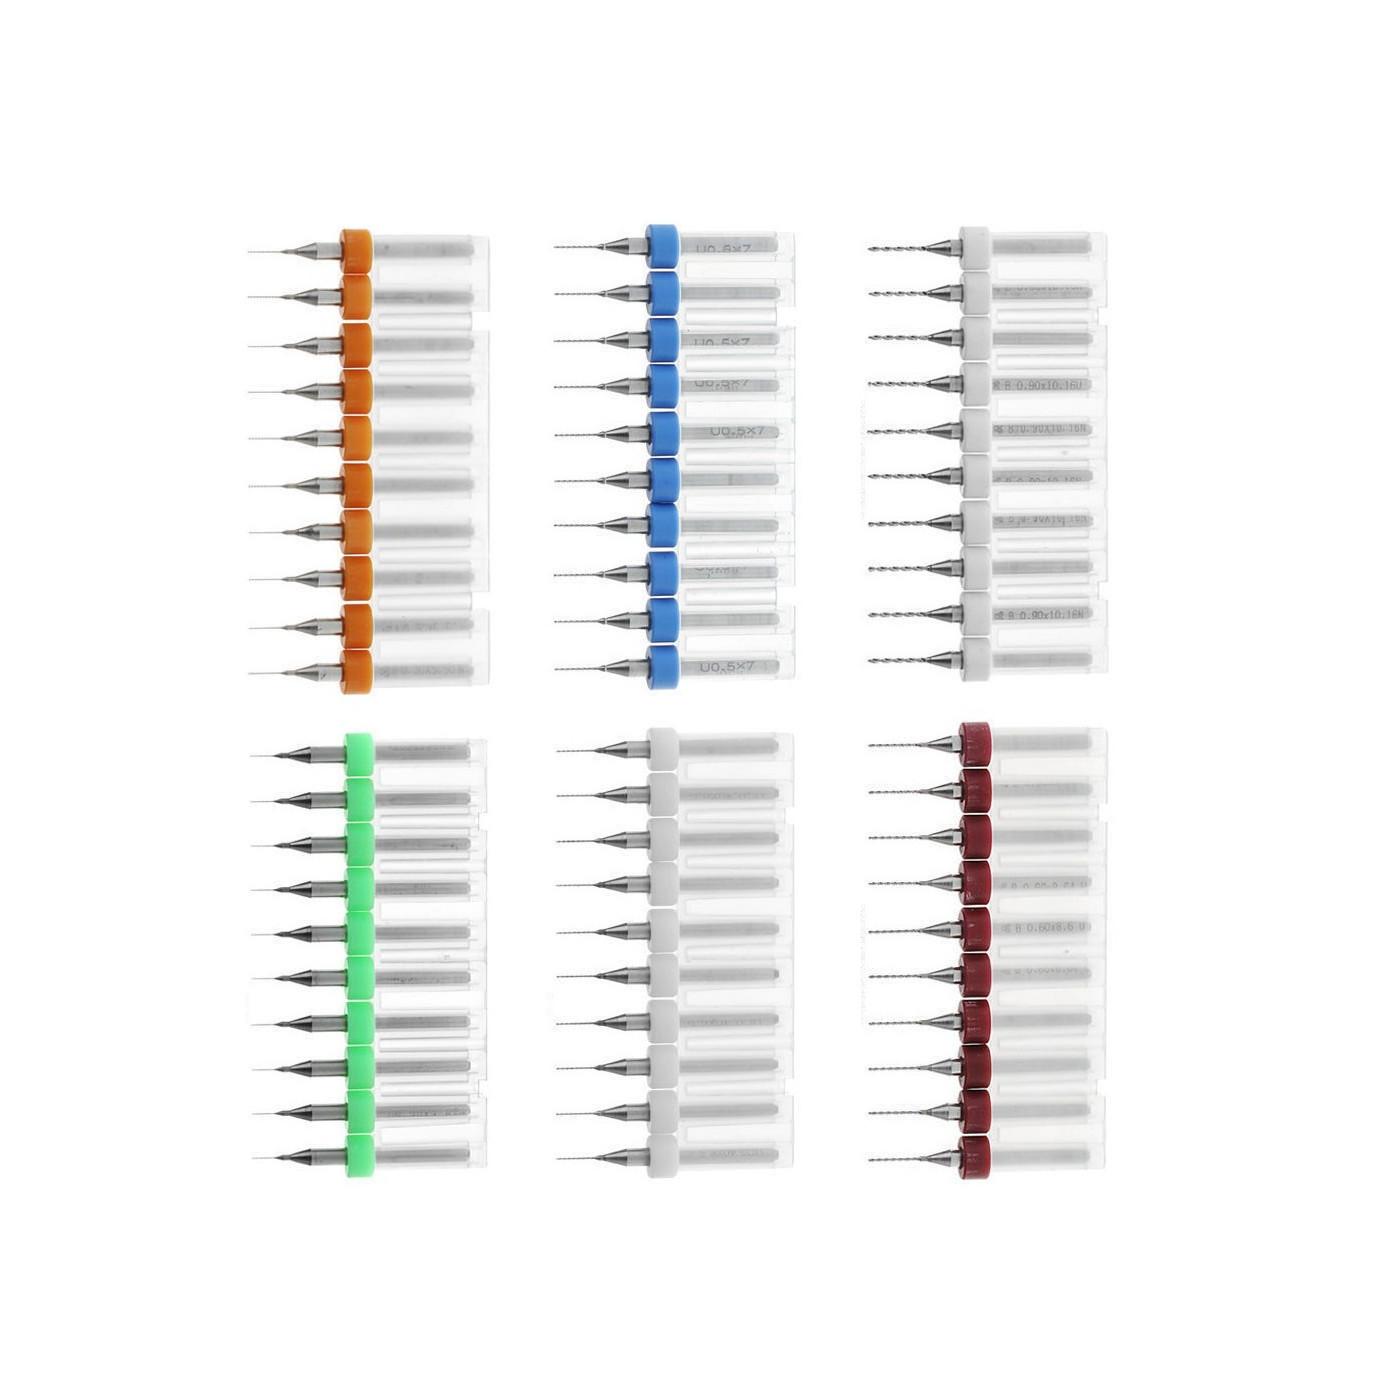 Combi set of 10 micro drill bits in box (0.10-1.00 mm)